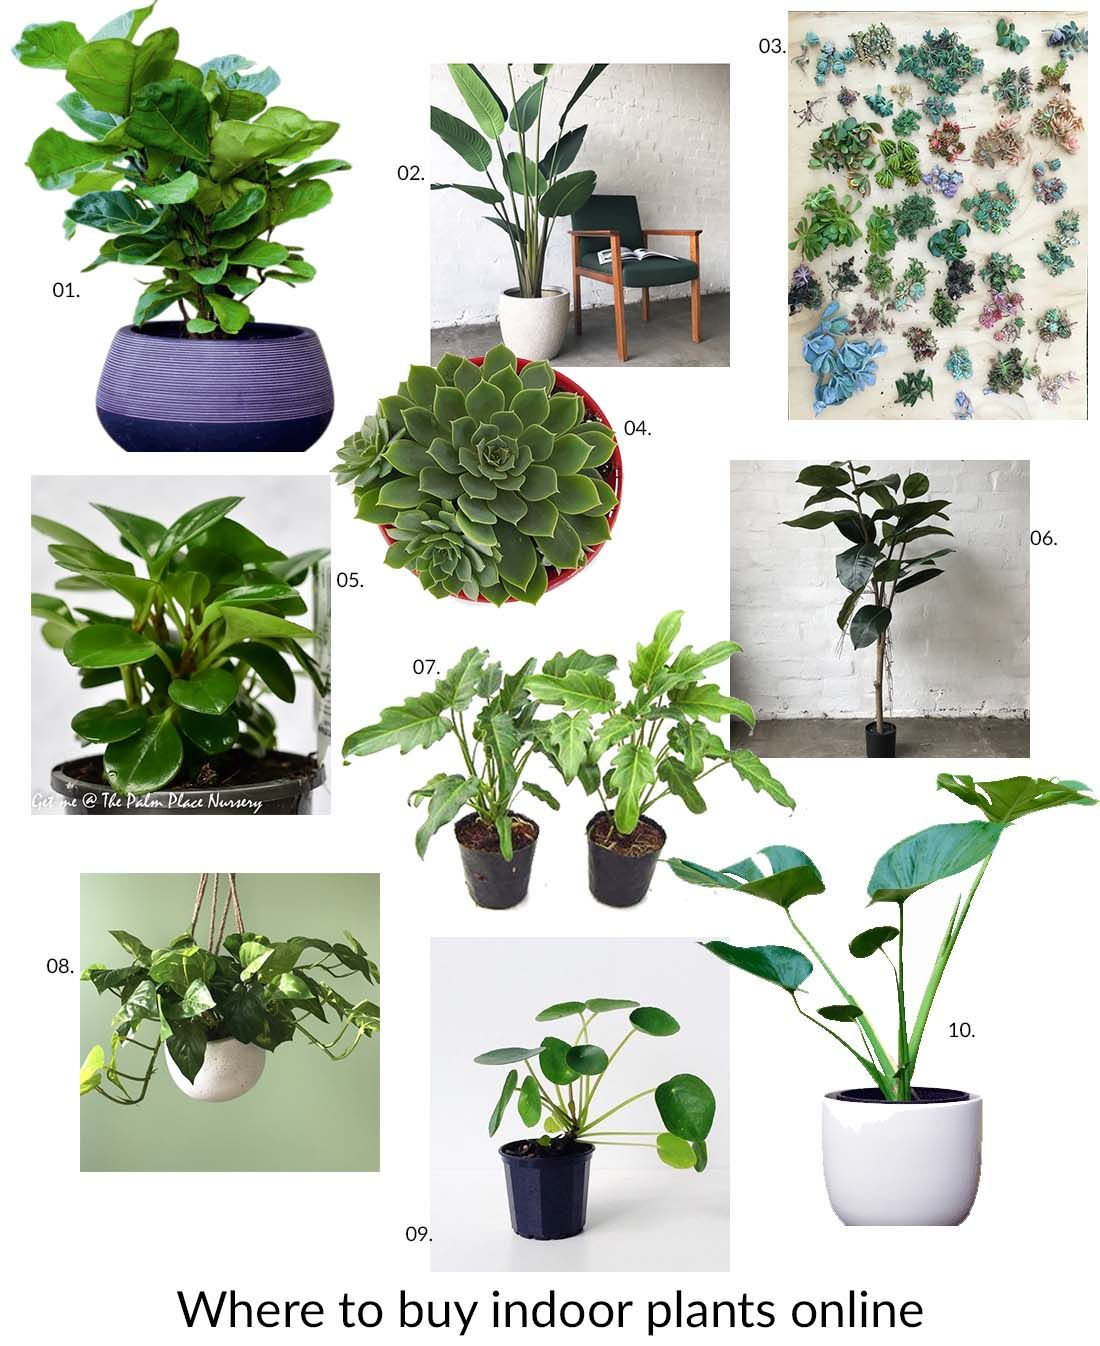 Grünpflanzen Green Plants Zimmerpflanzen: Where To Buy Indoor Plants Online